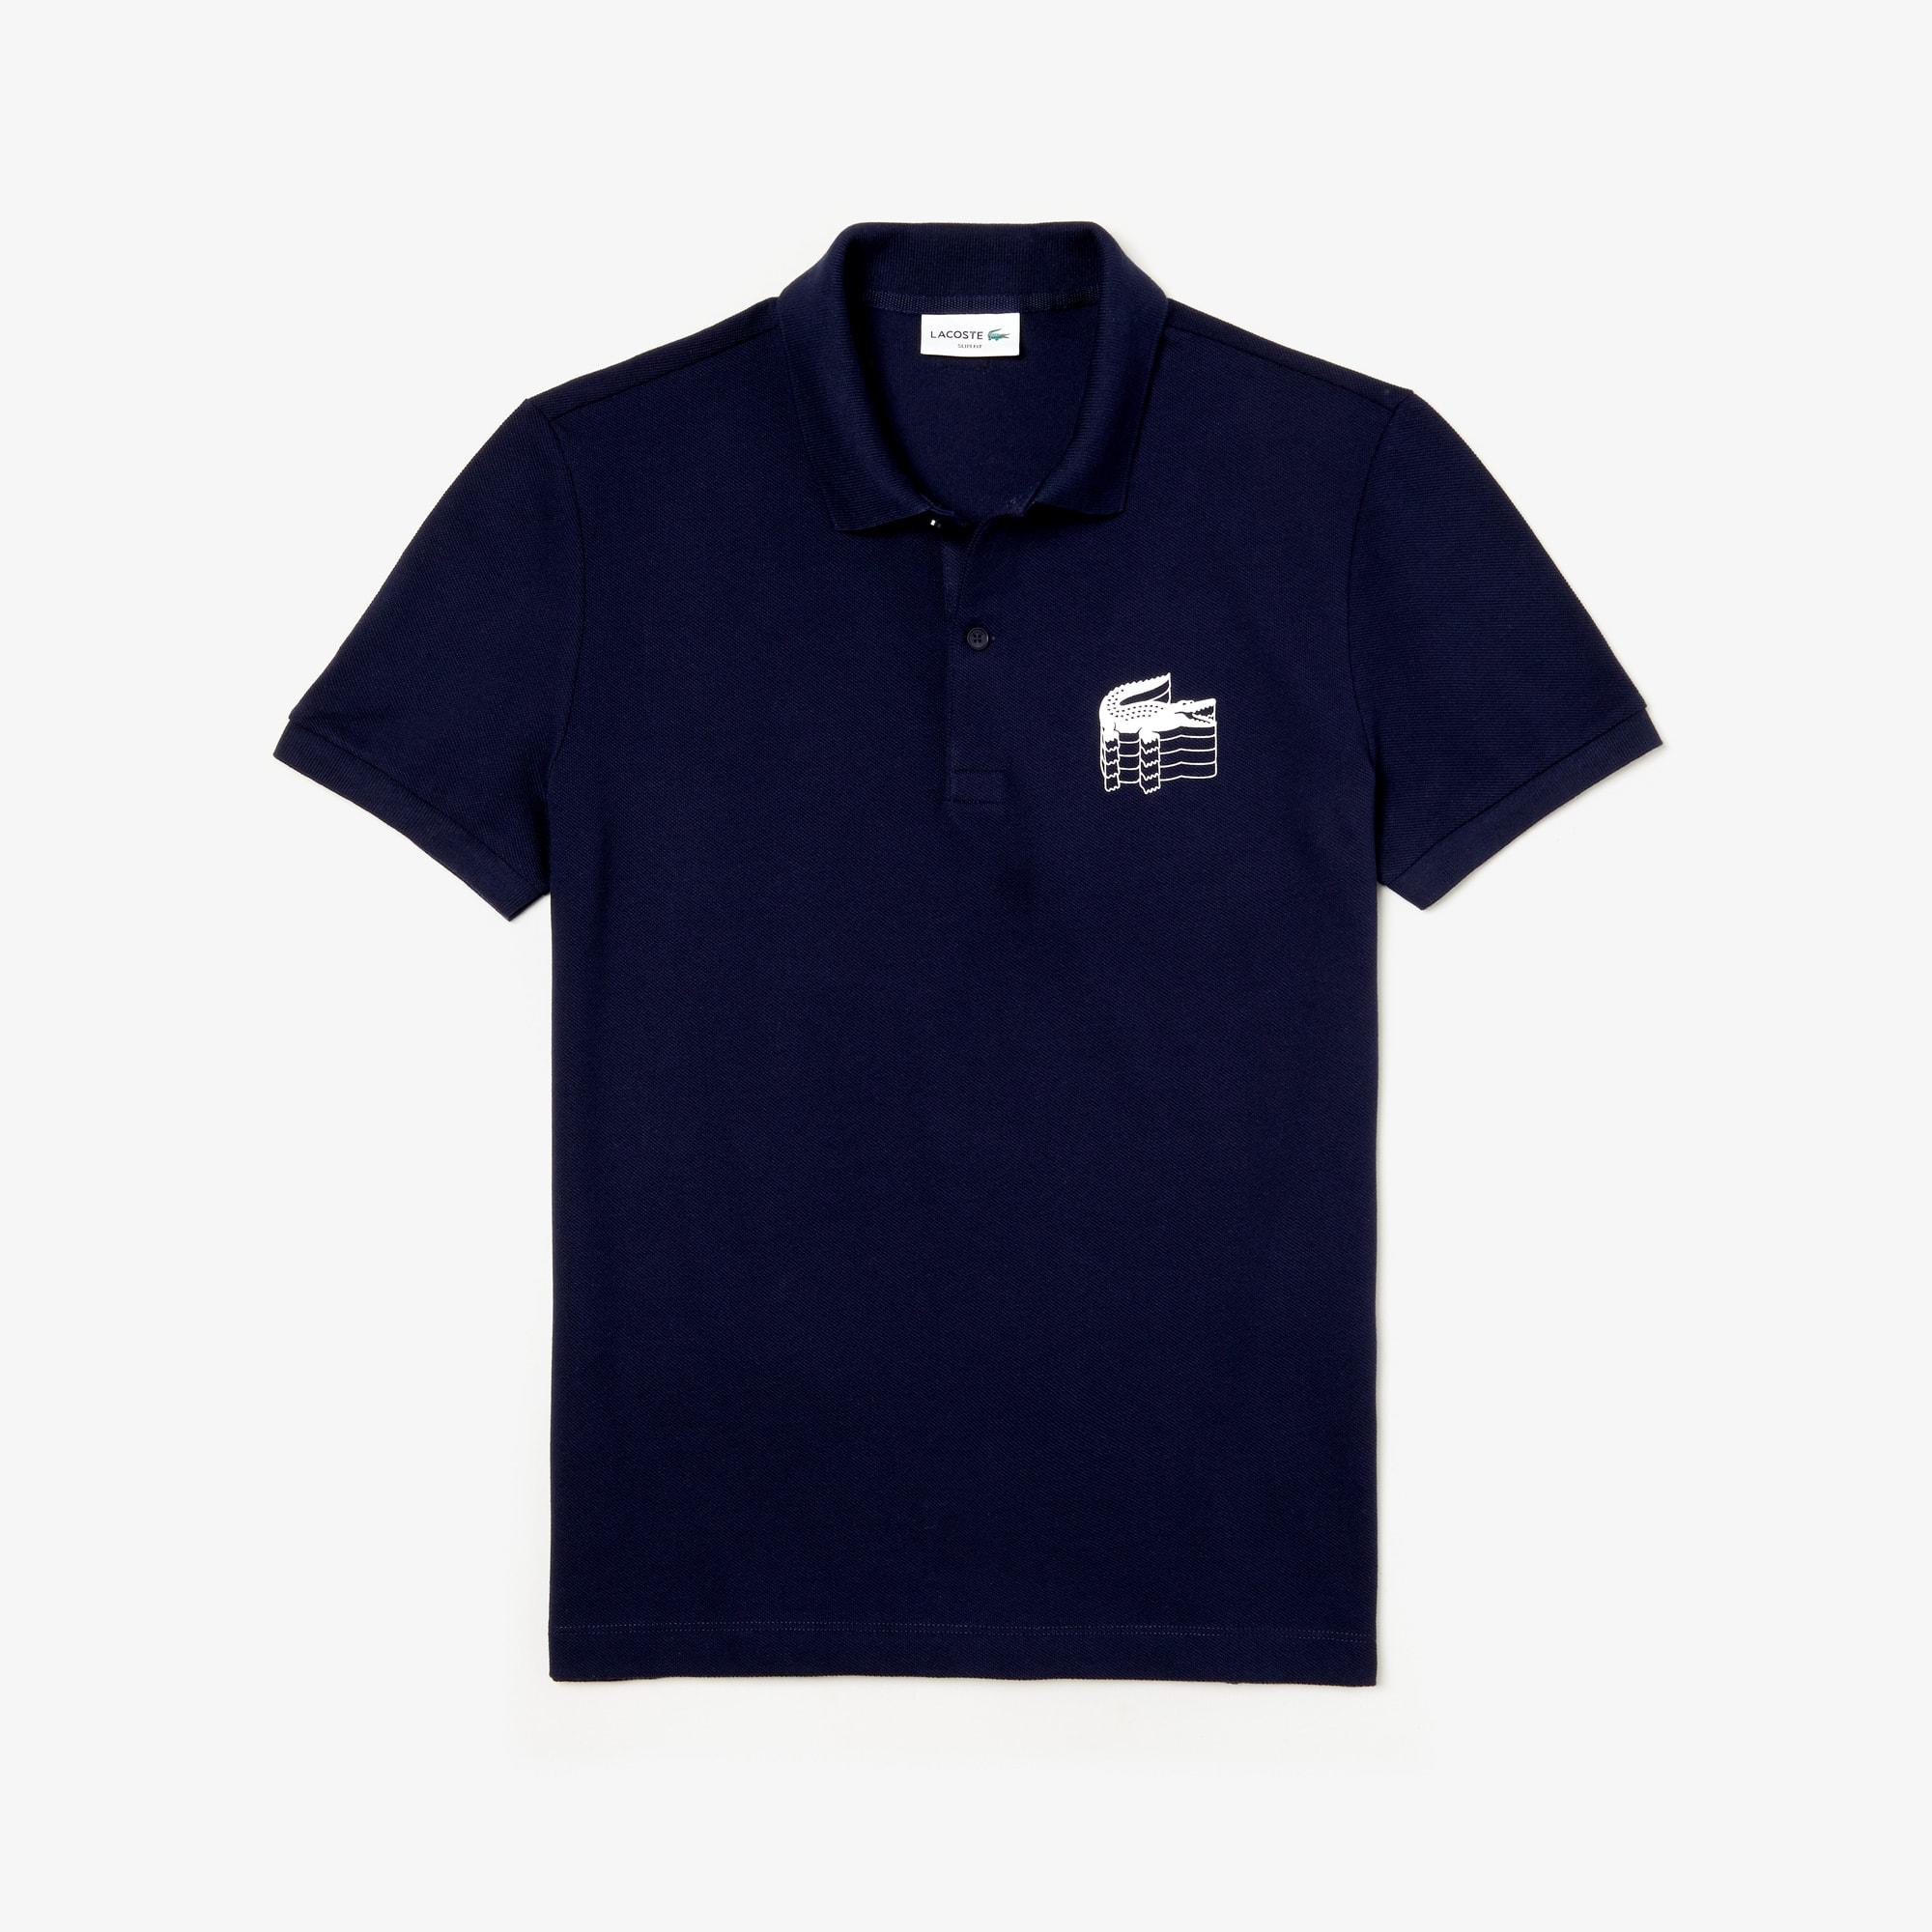 Men S Polo Shirts Lacoste Polo Shirts For Men Lacoste